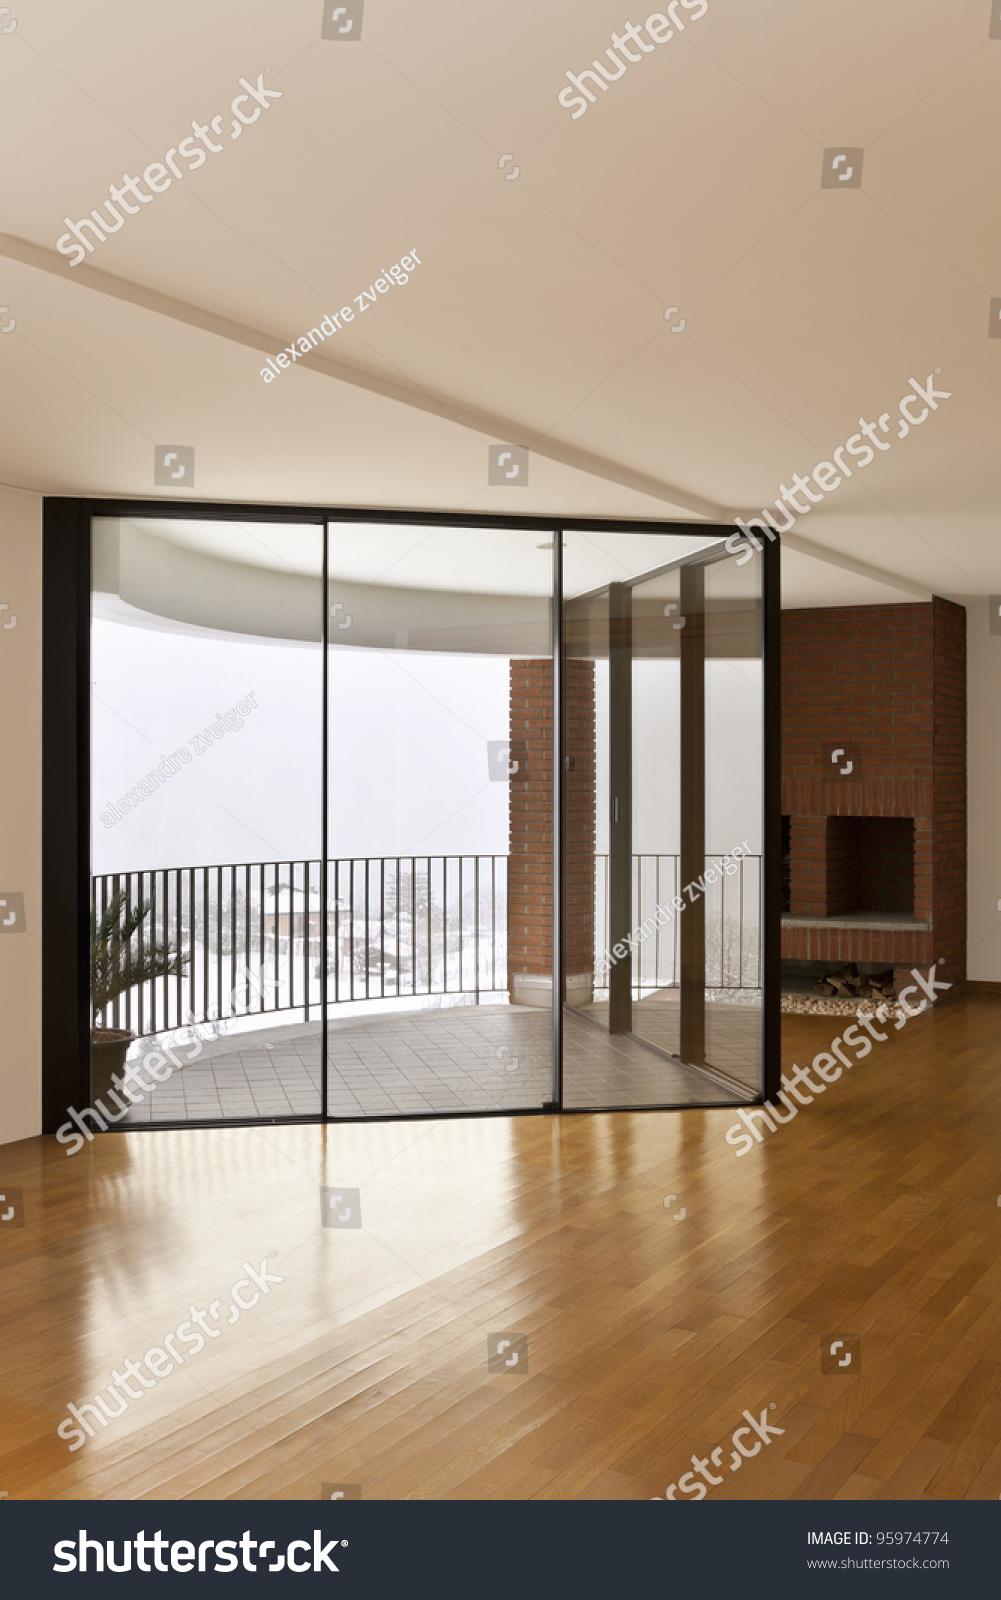 Beautiful apartment interior hardwood floors large for Beautiful flats interior